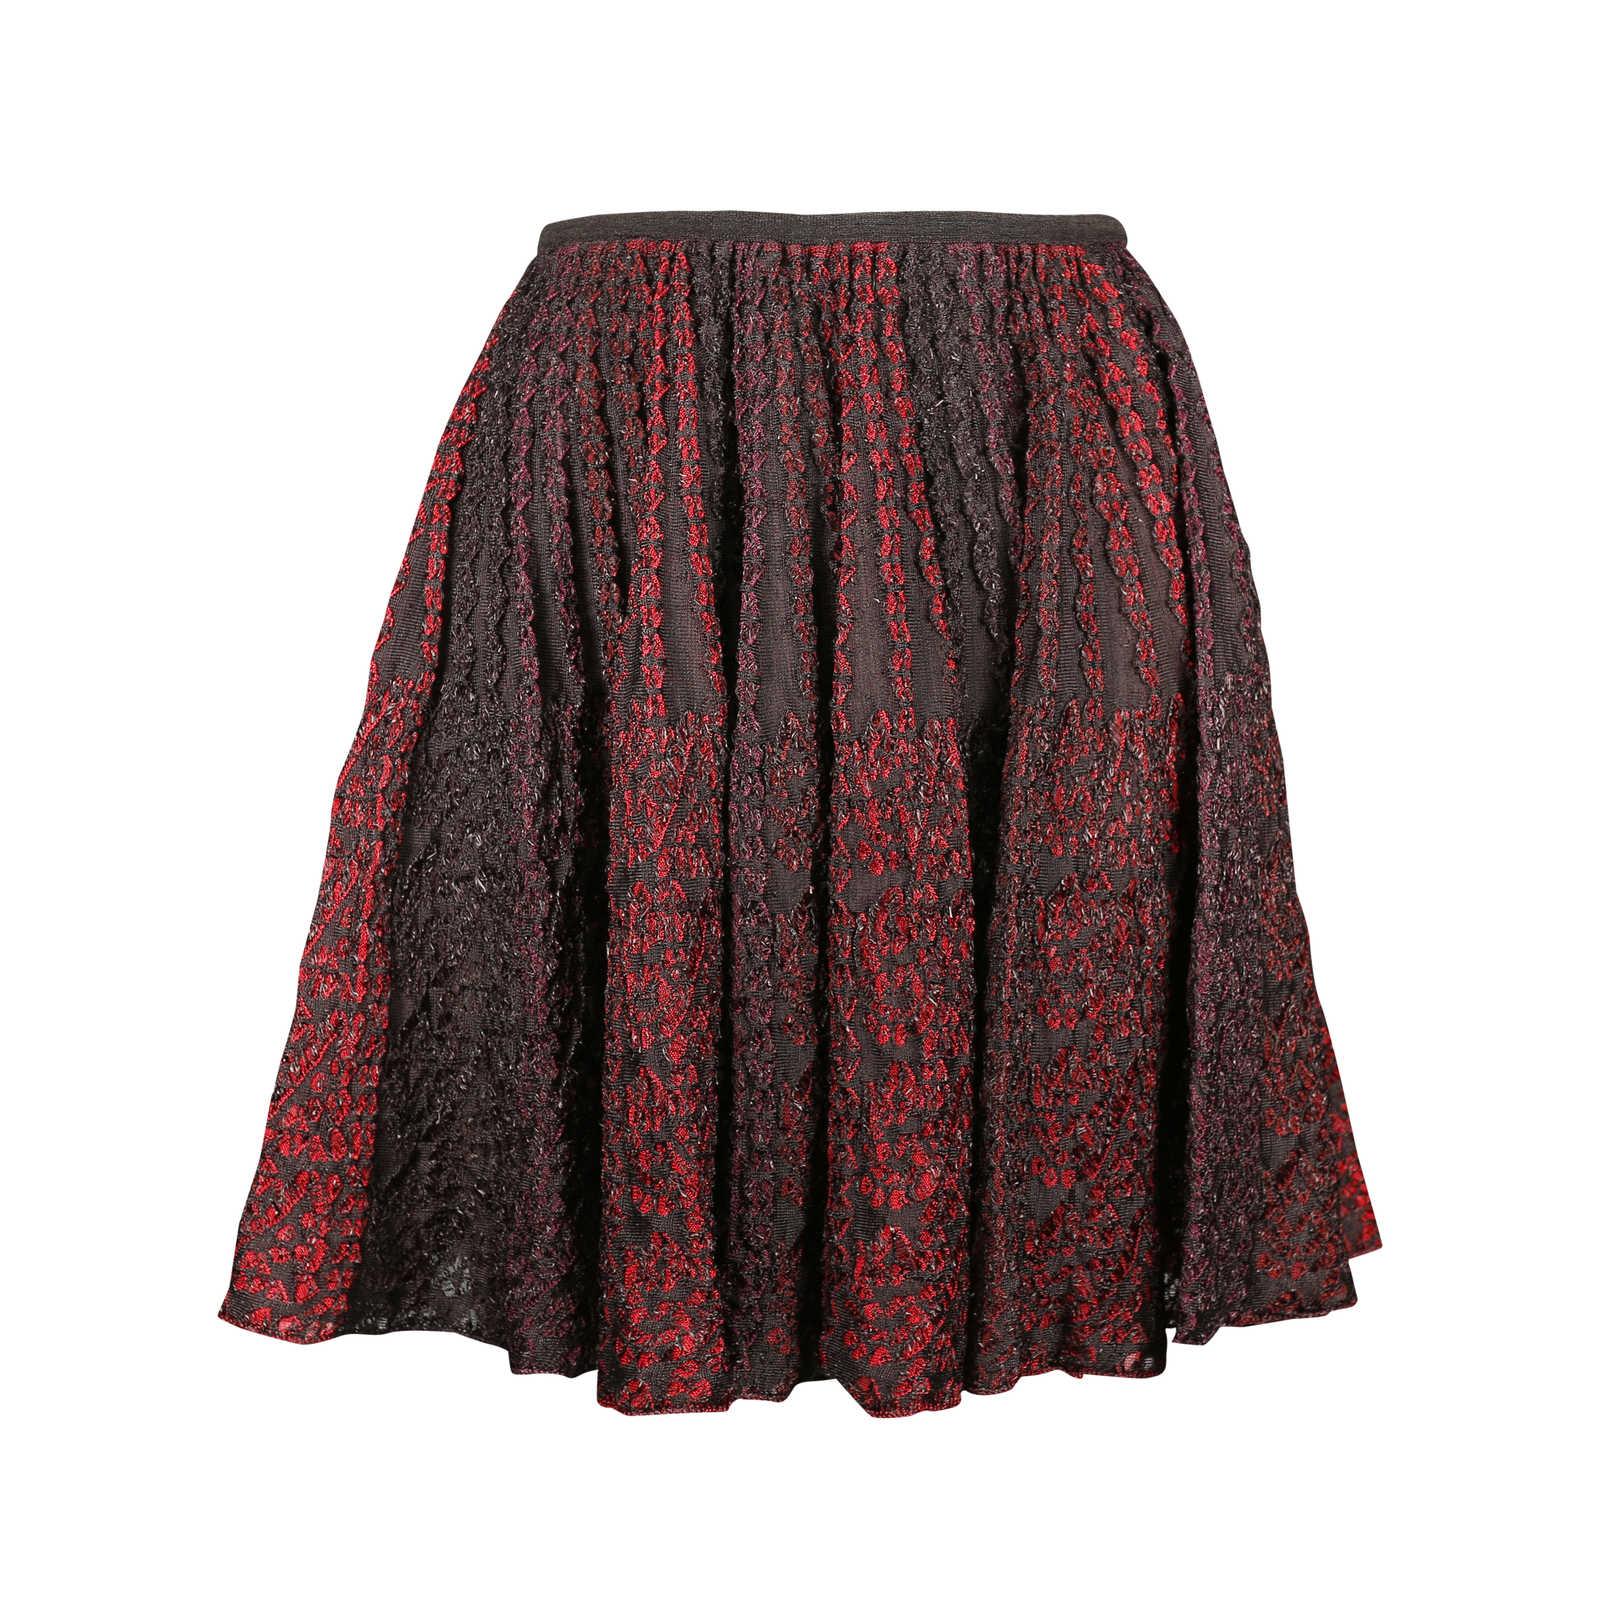 alaia-knit-skirt-1.jpg